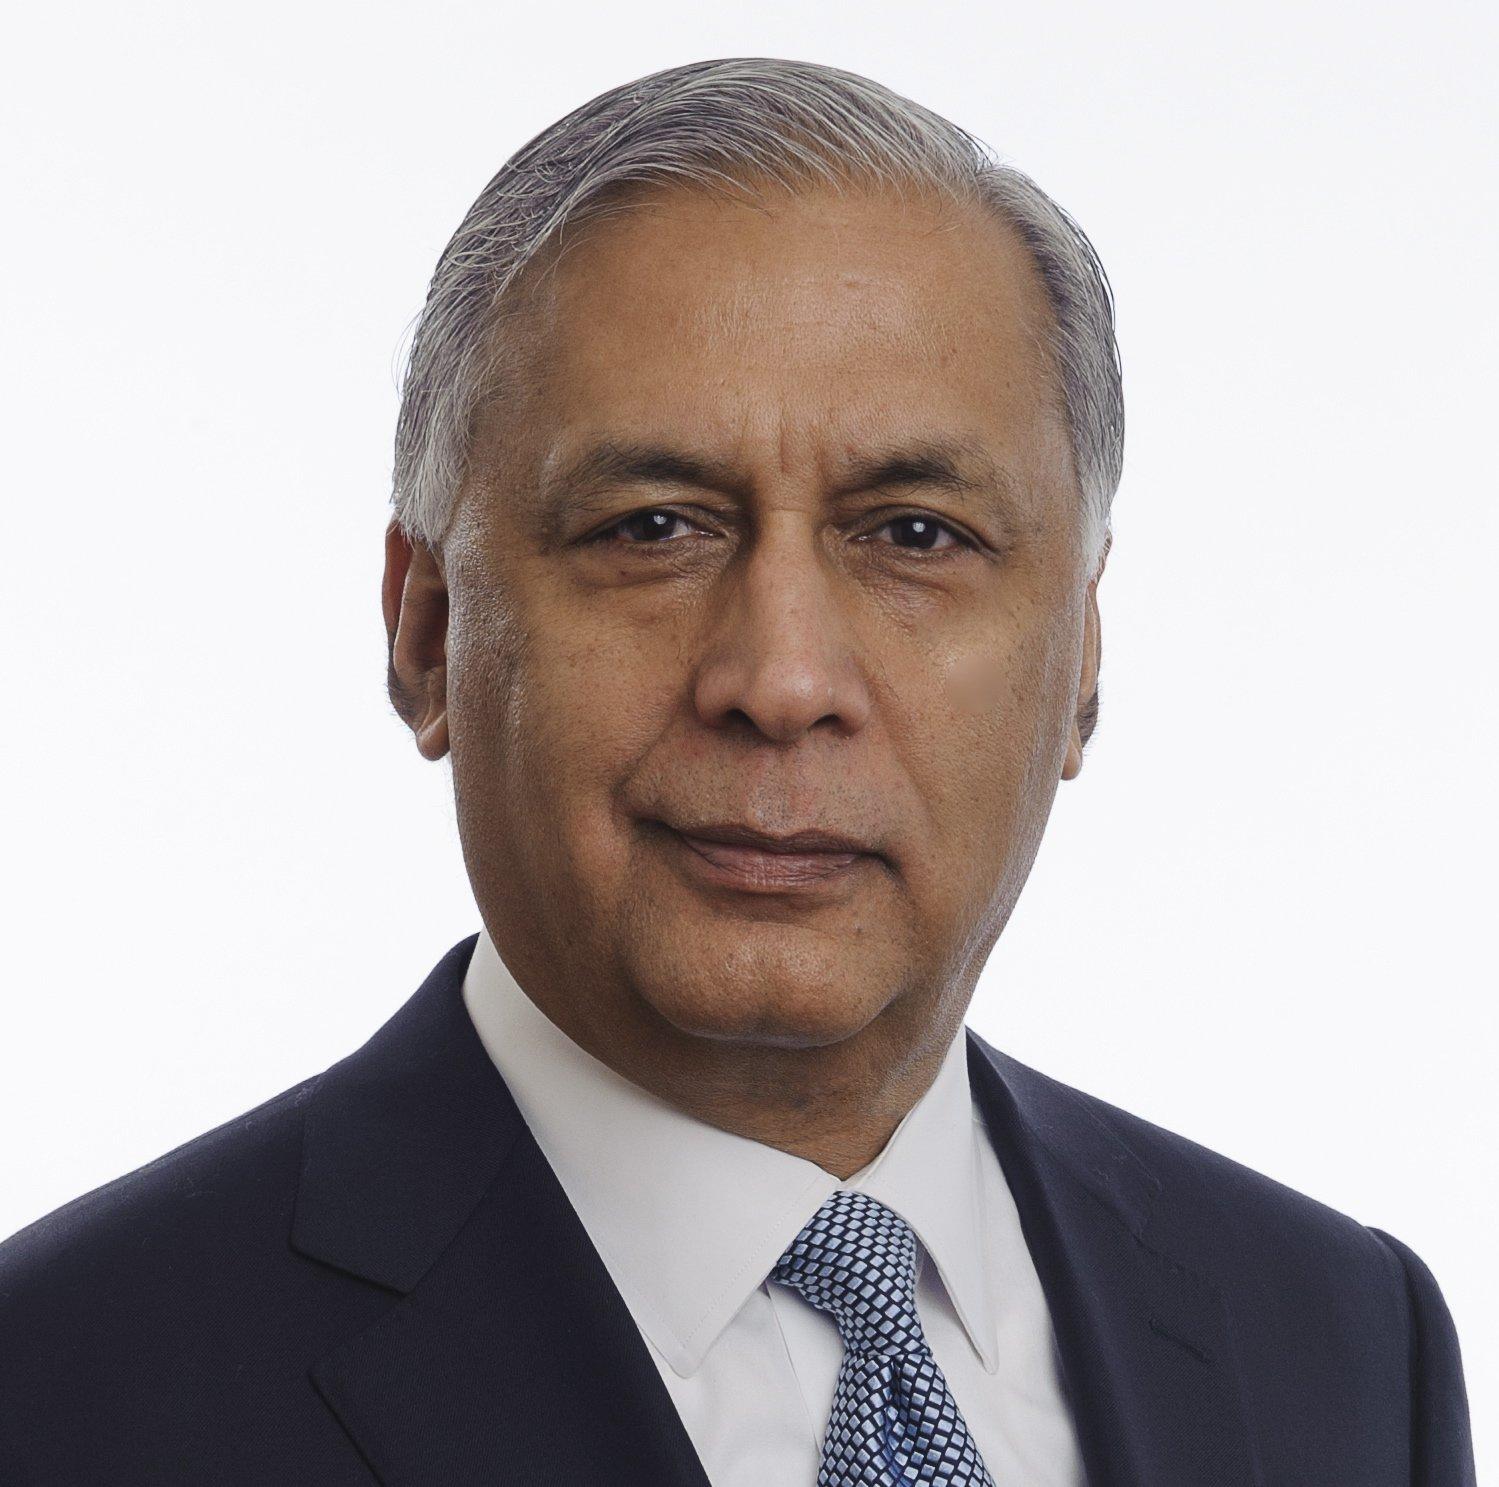 Shaukat Aziz Speaker